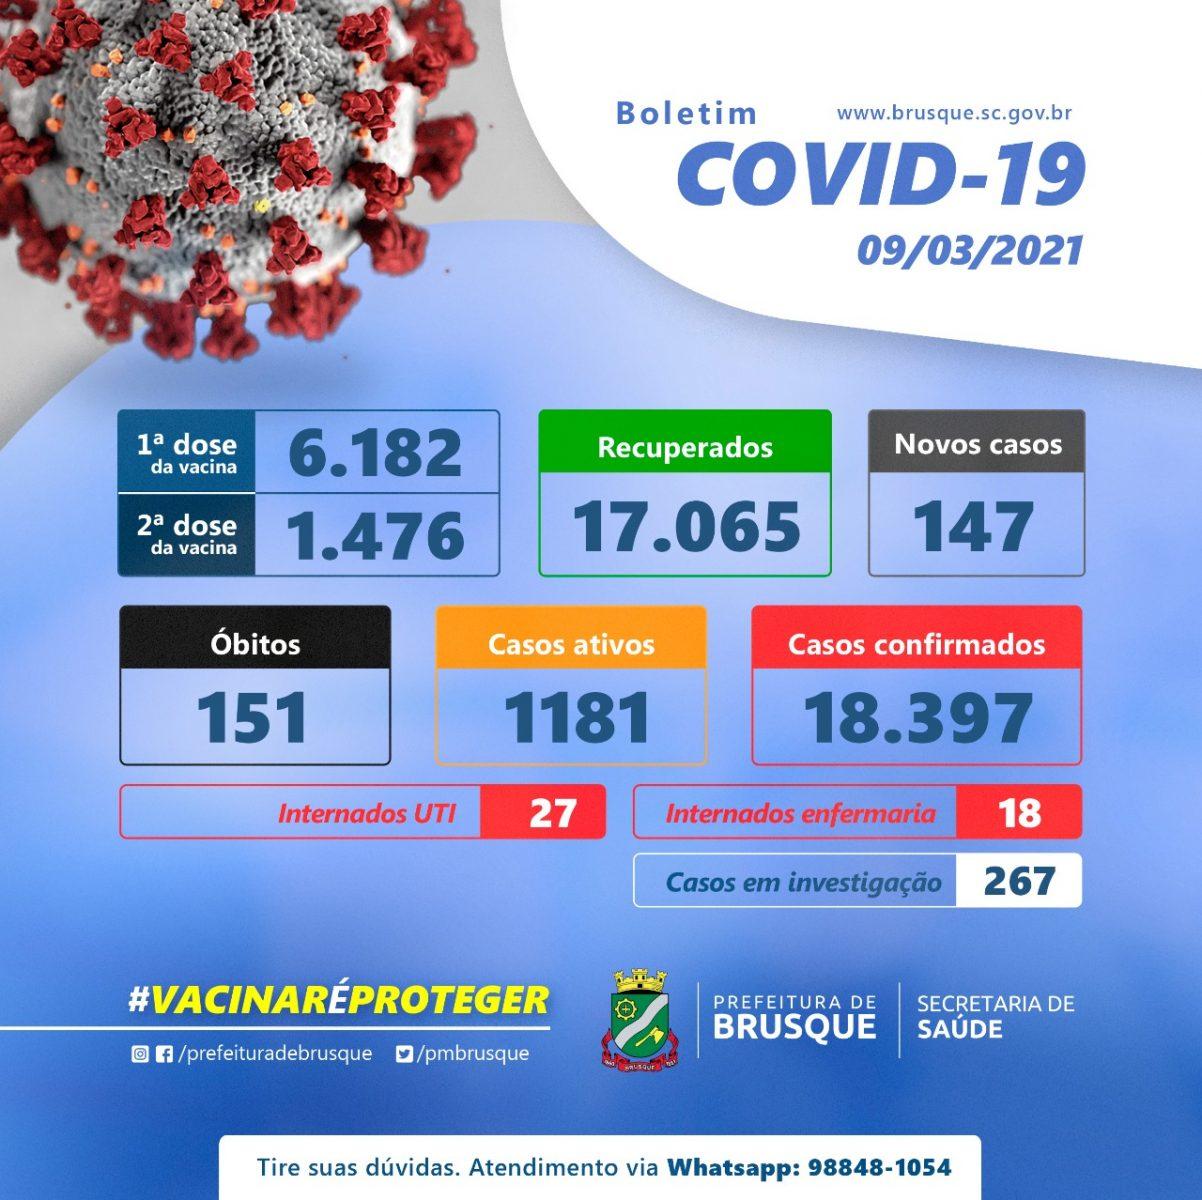 Covid-19: Confira o boletim epidemiológico desta terça-feira (09)